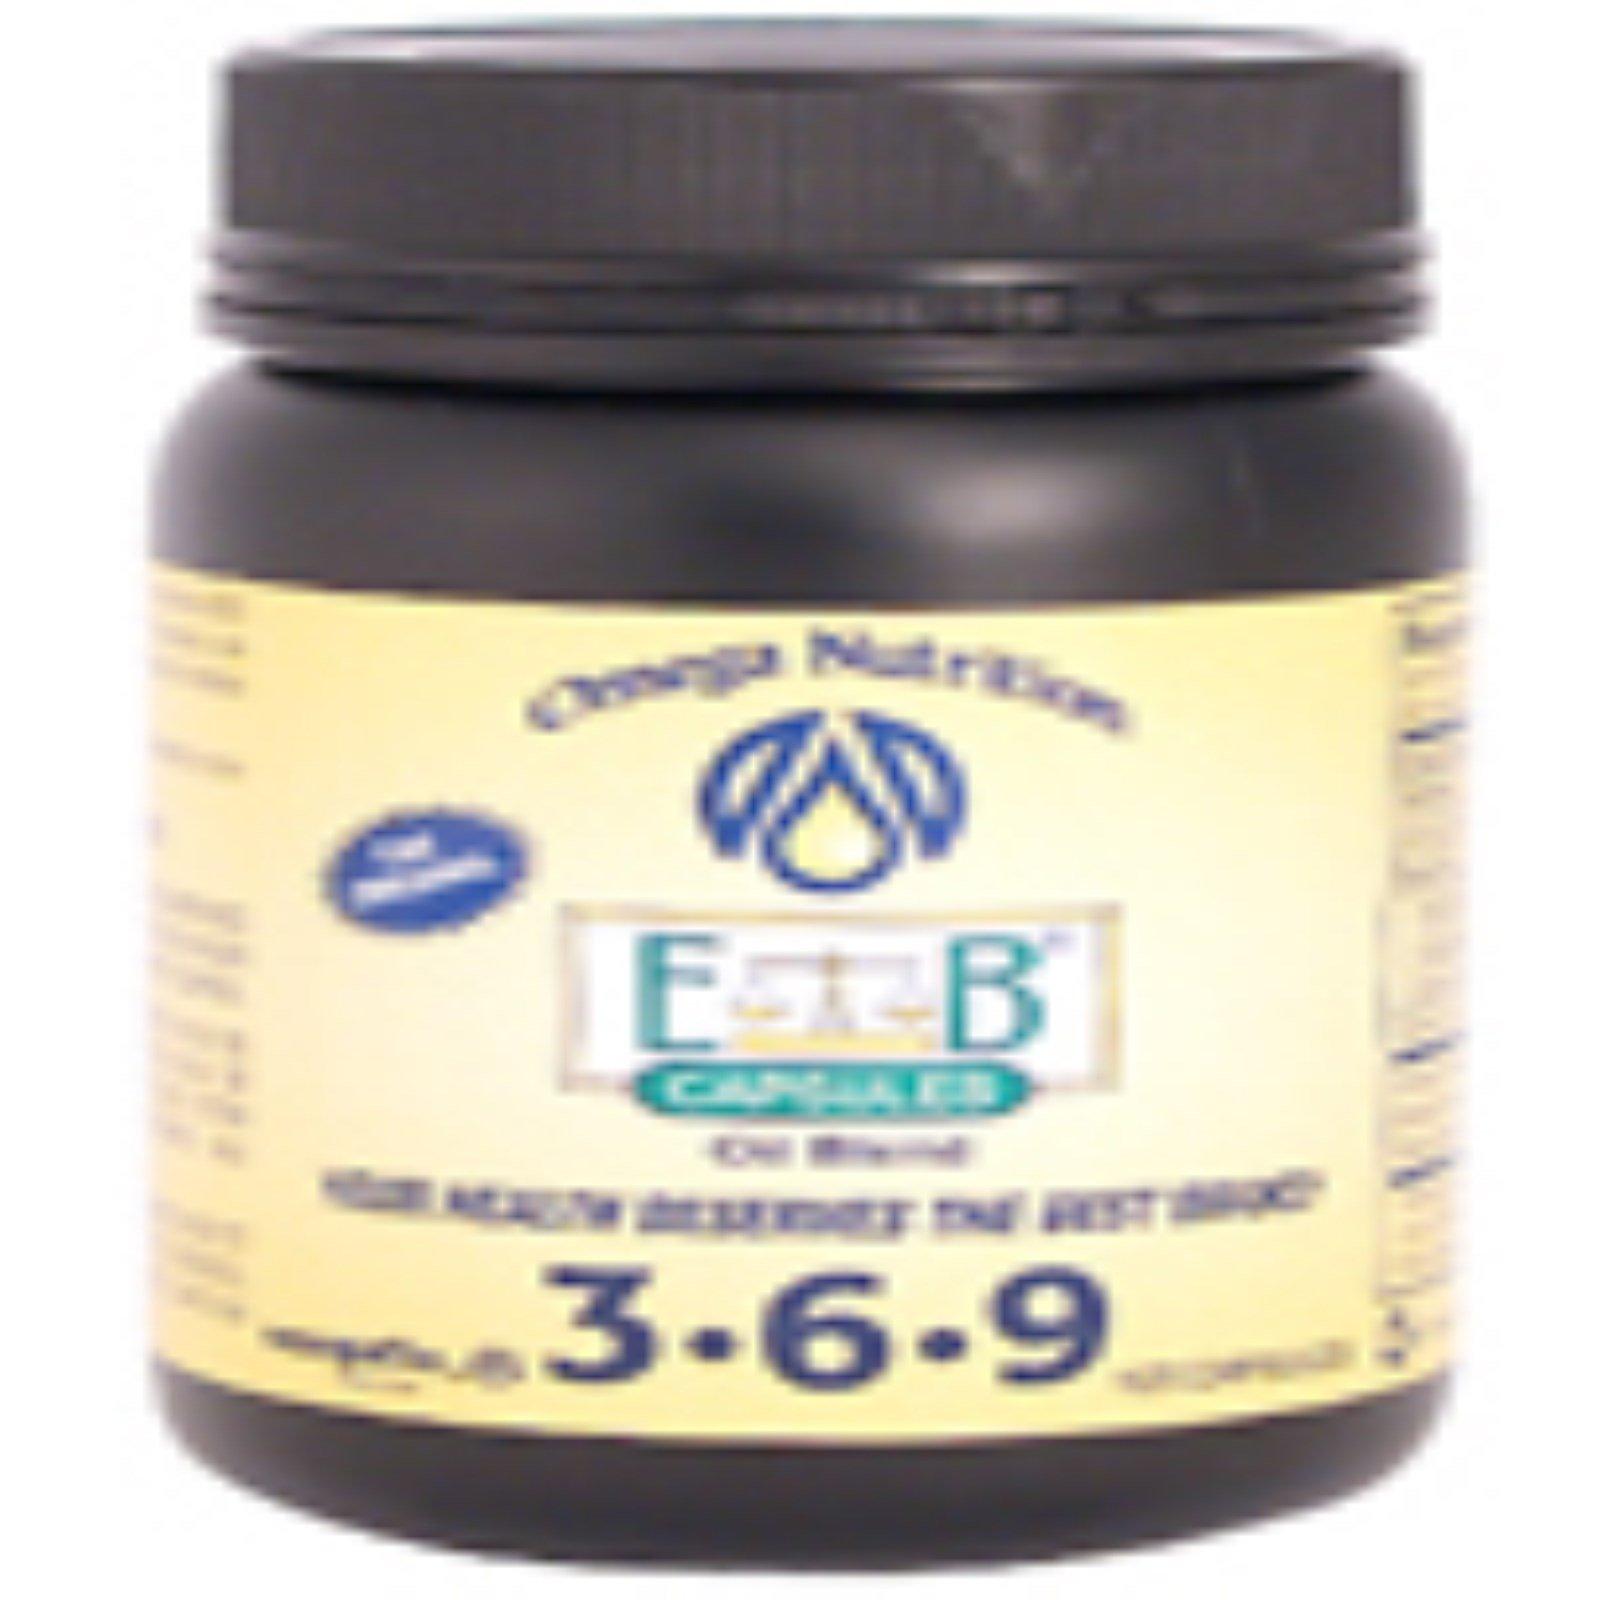 Jarrow Formulas Omega Nutrition 3 6 9 Essential Balance Oil